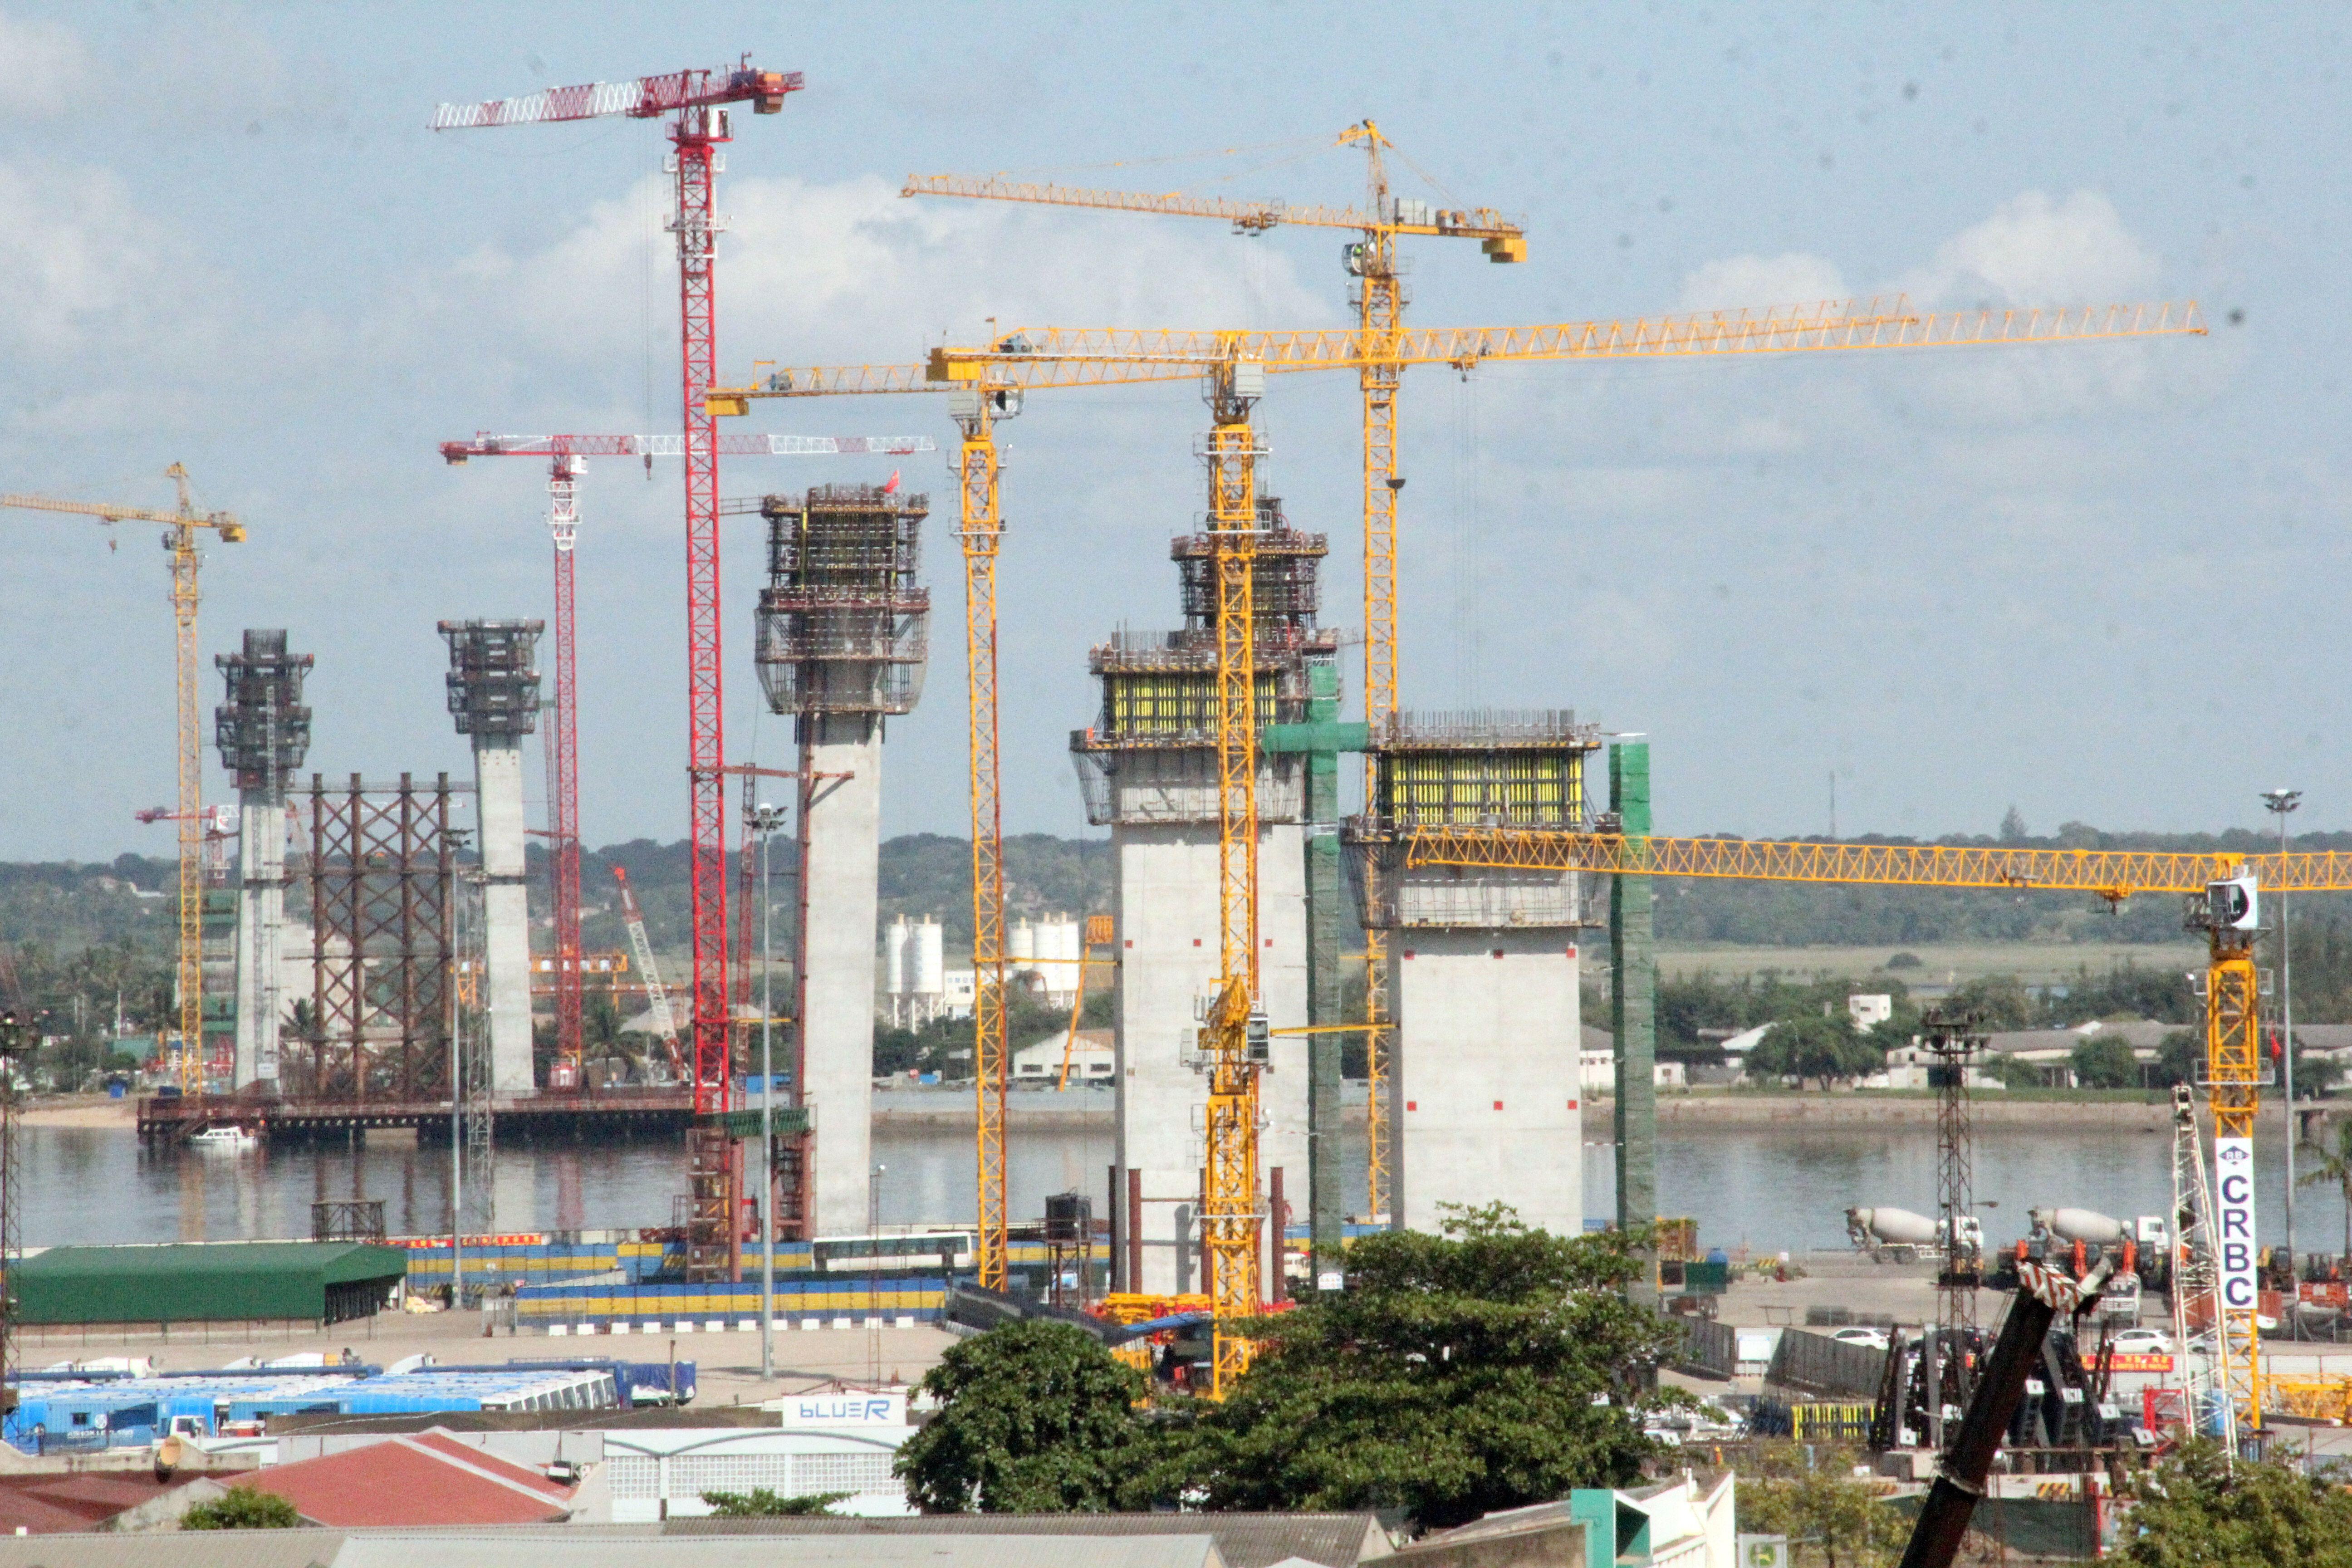 Cranes constructing the Katembe suspension bridge in gas-rich Mozambique's capital Maputo.